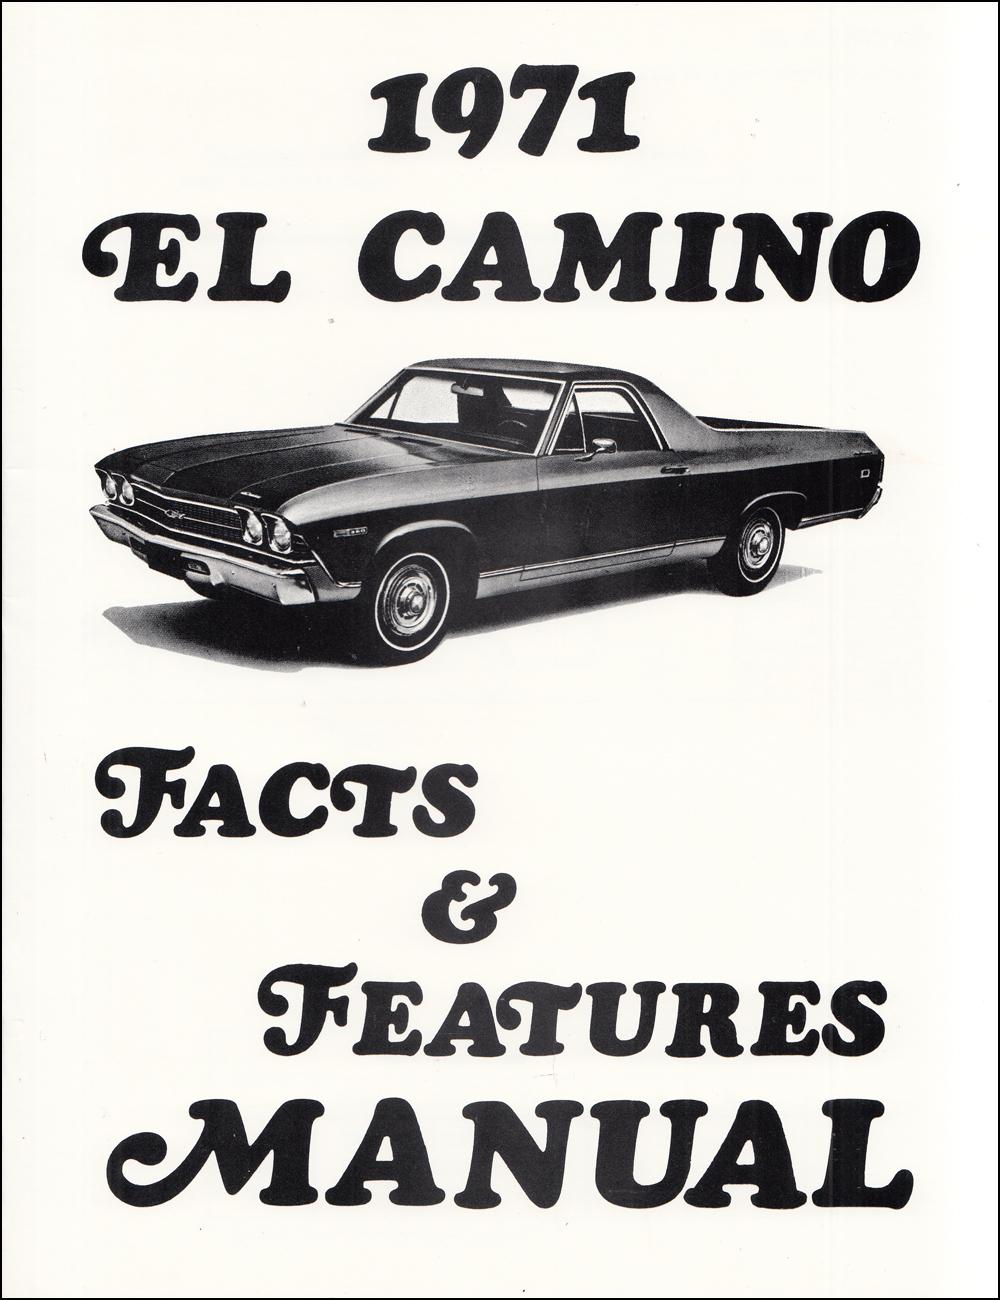 1971 Chevelle Wiring Diagram Manual Reprint Malibu, SS, El Camino